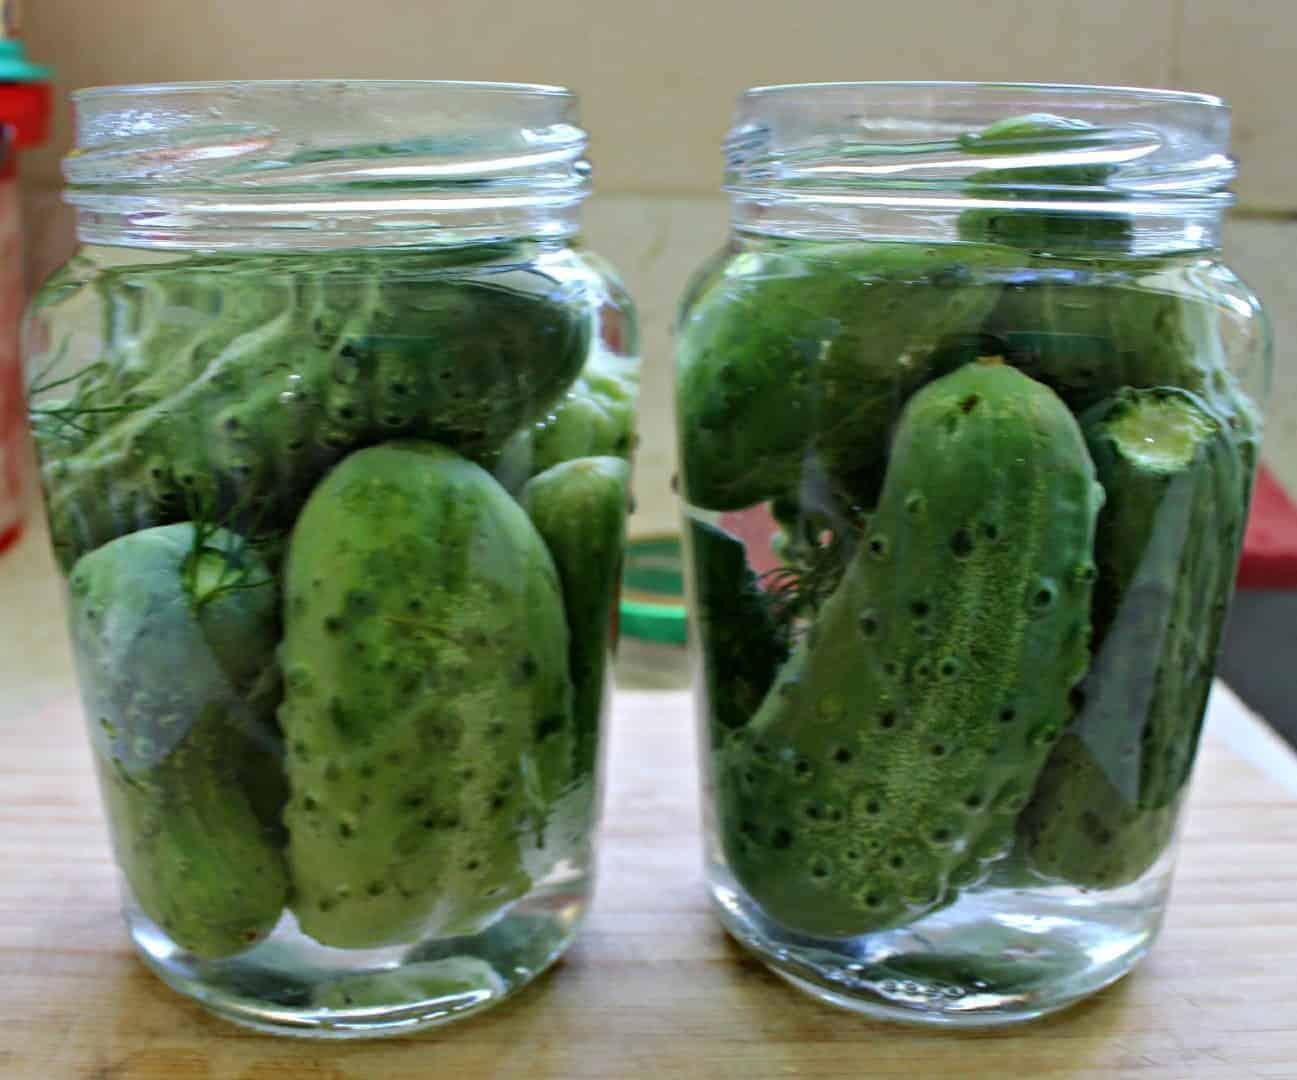 Homemade crunchy, tangy bottled gherkins